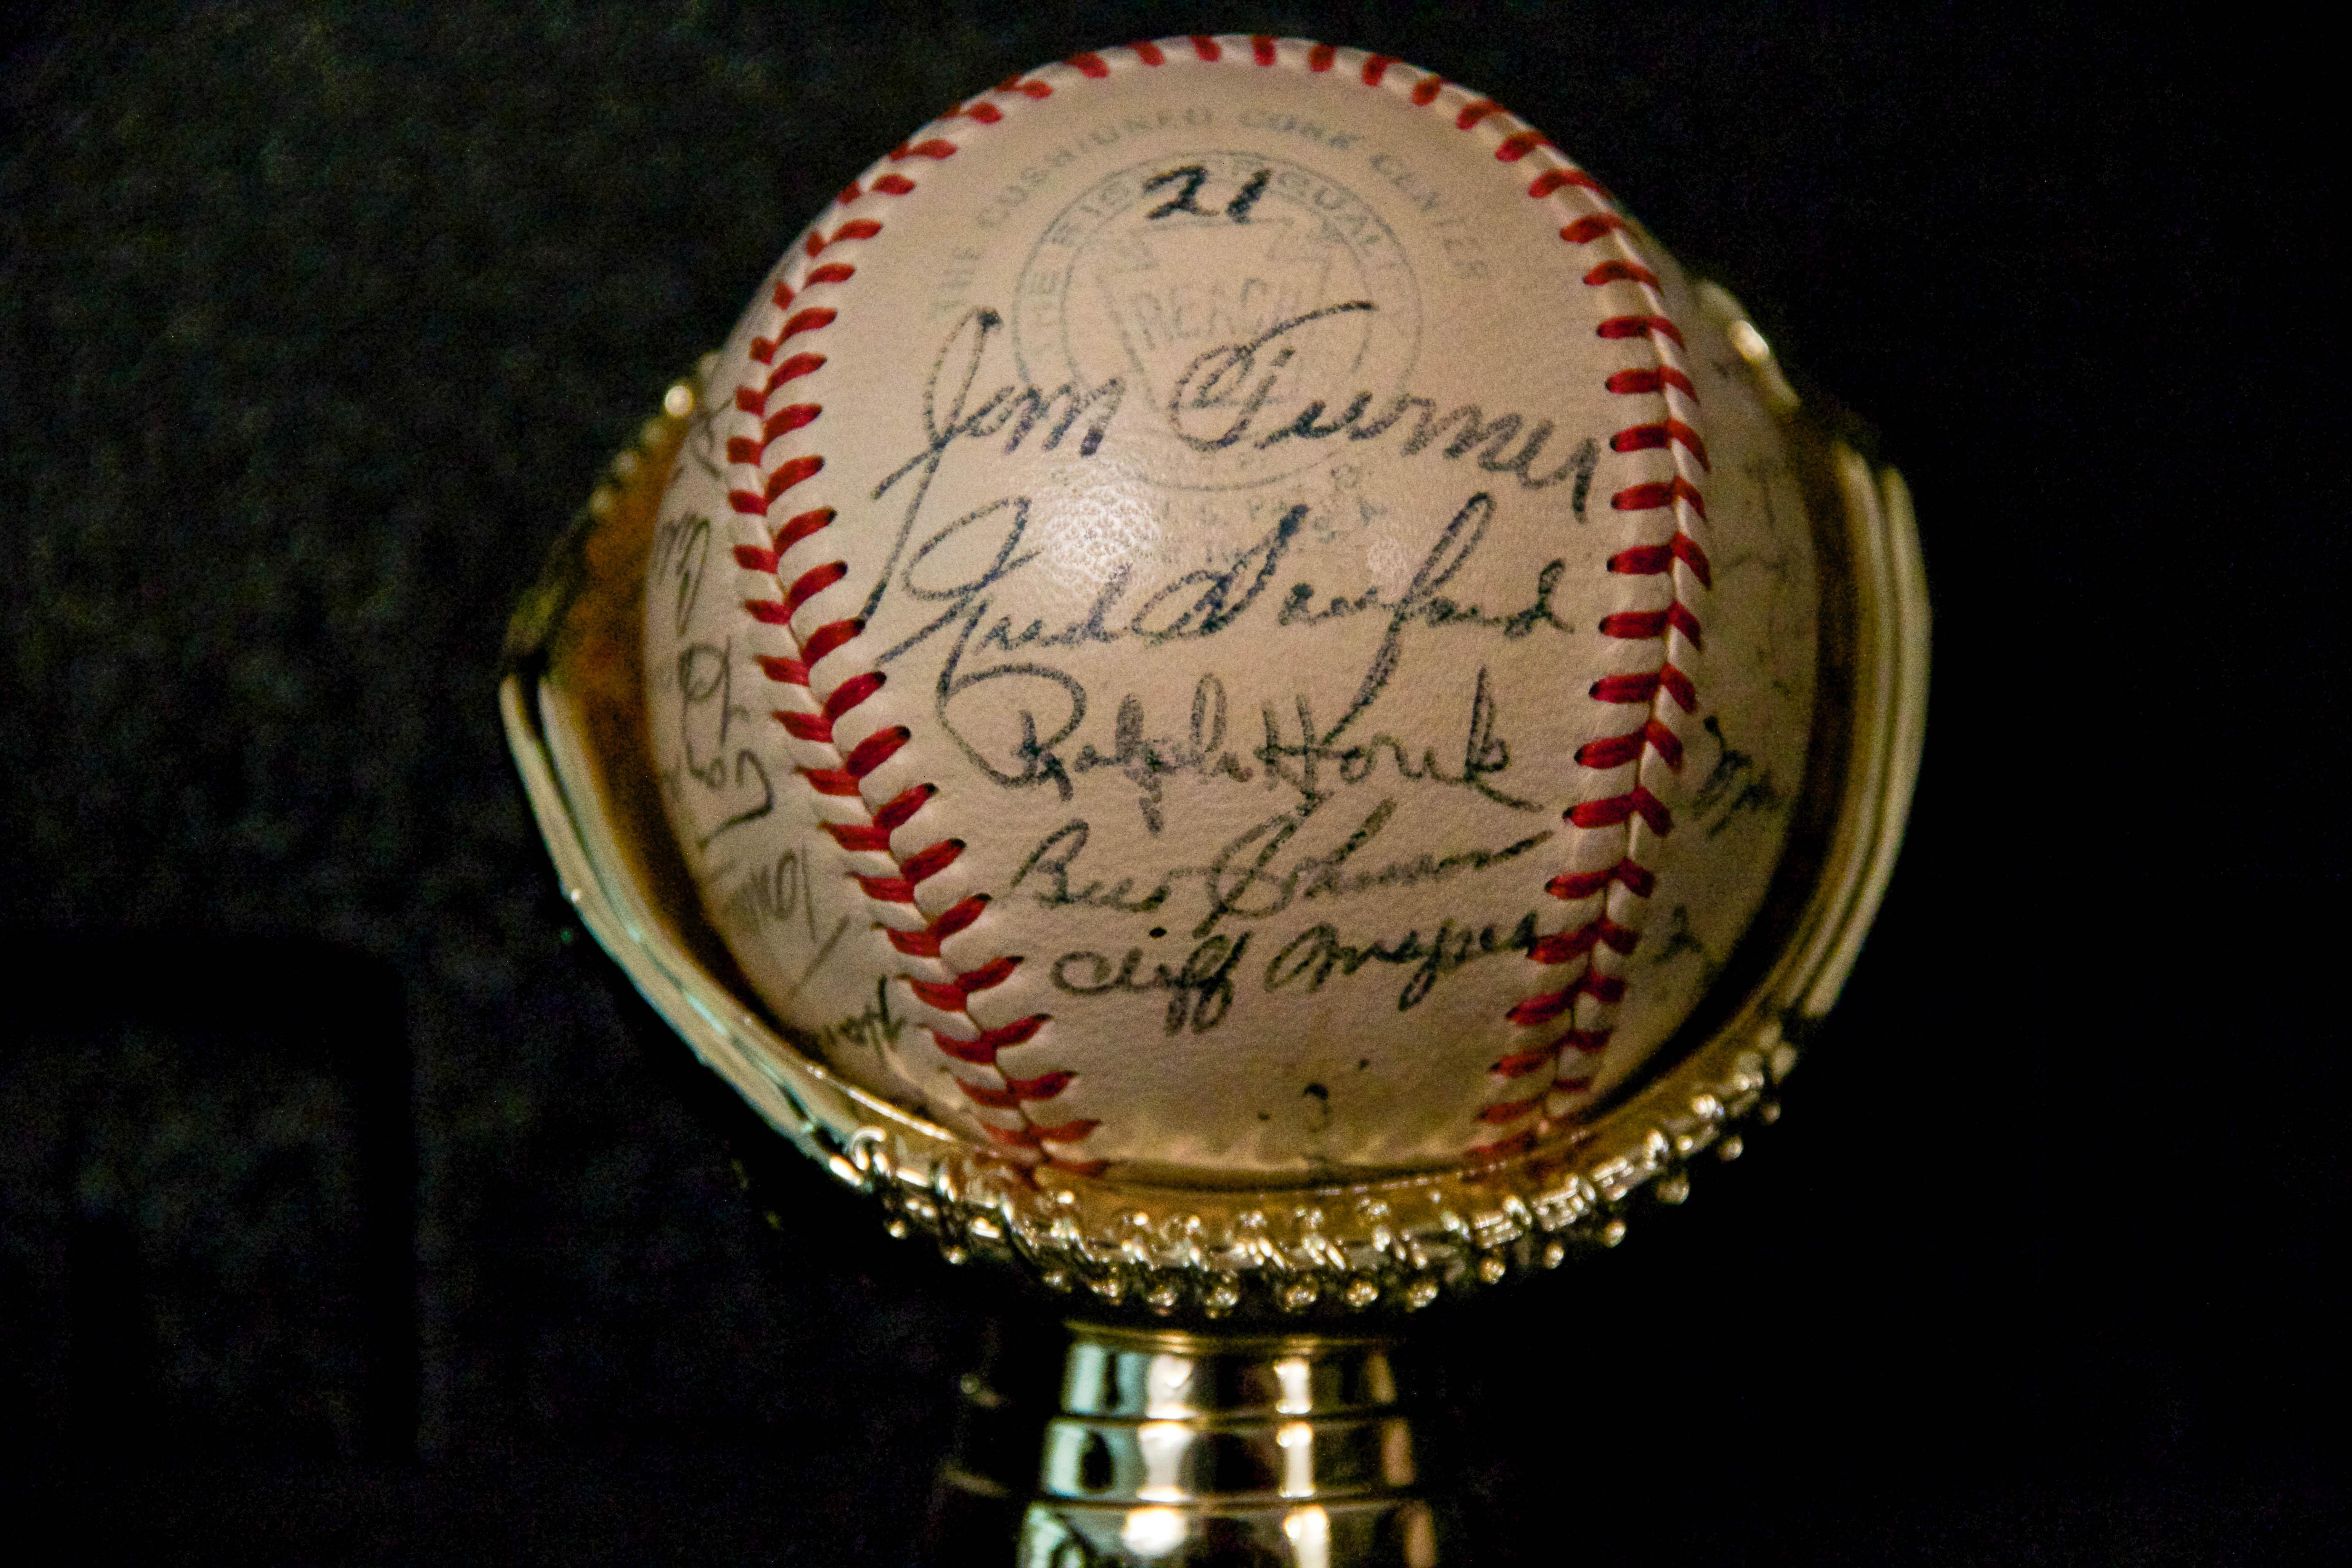 1950 World Series Champions